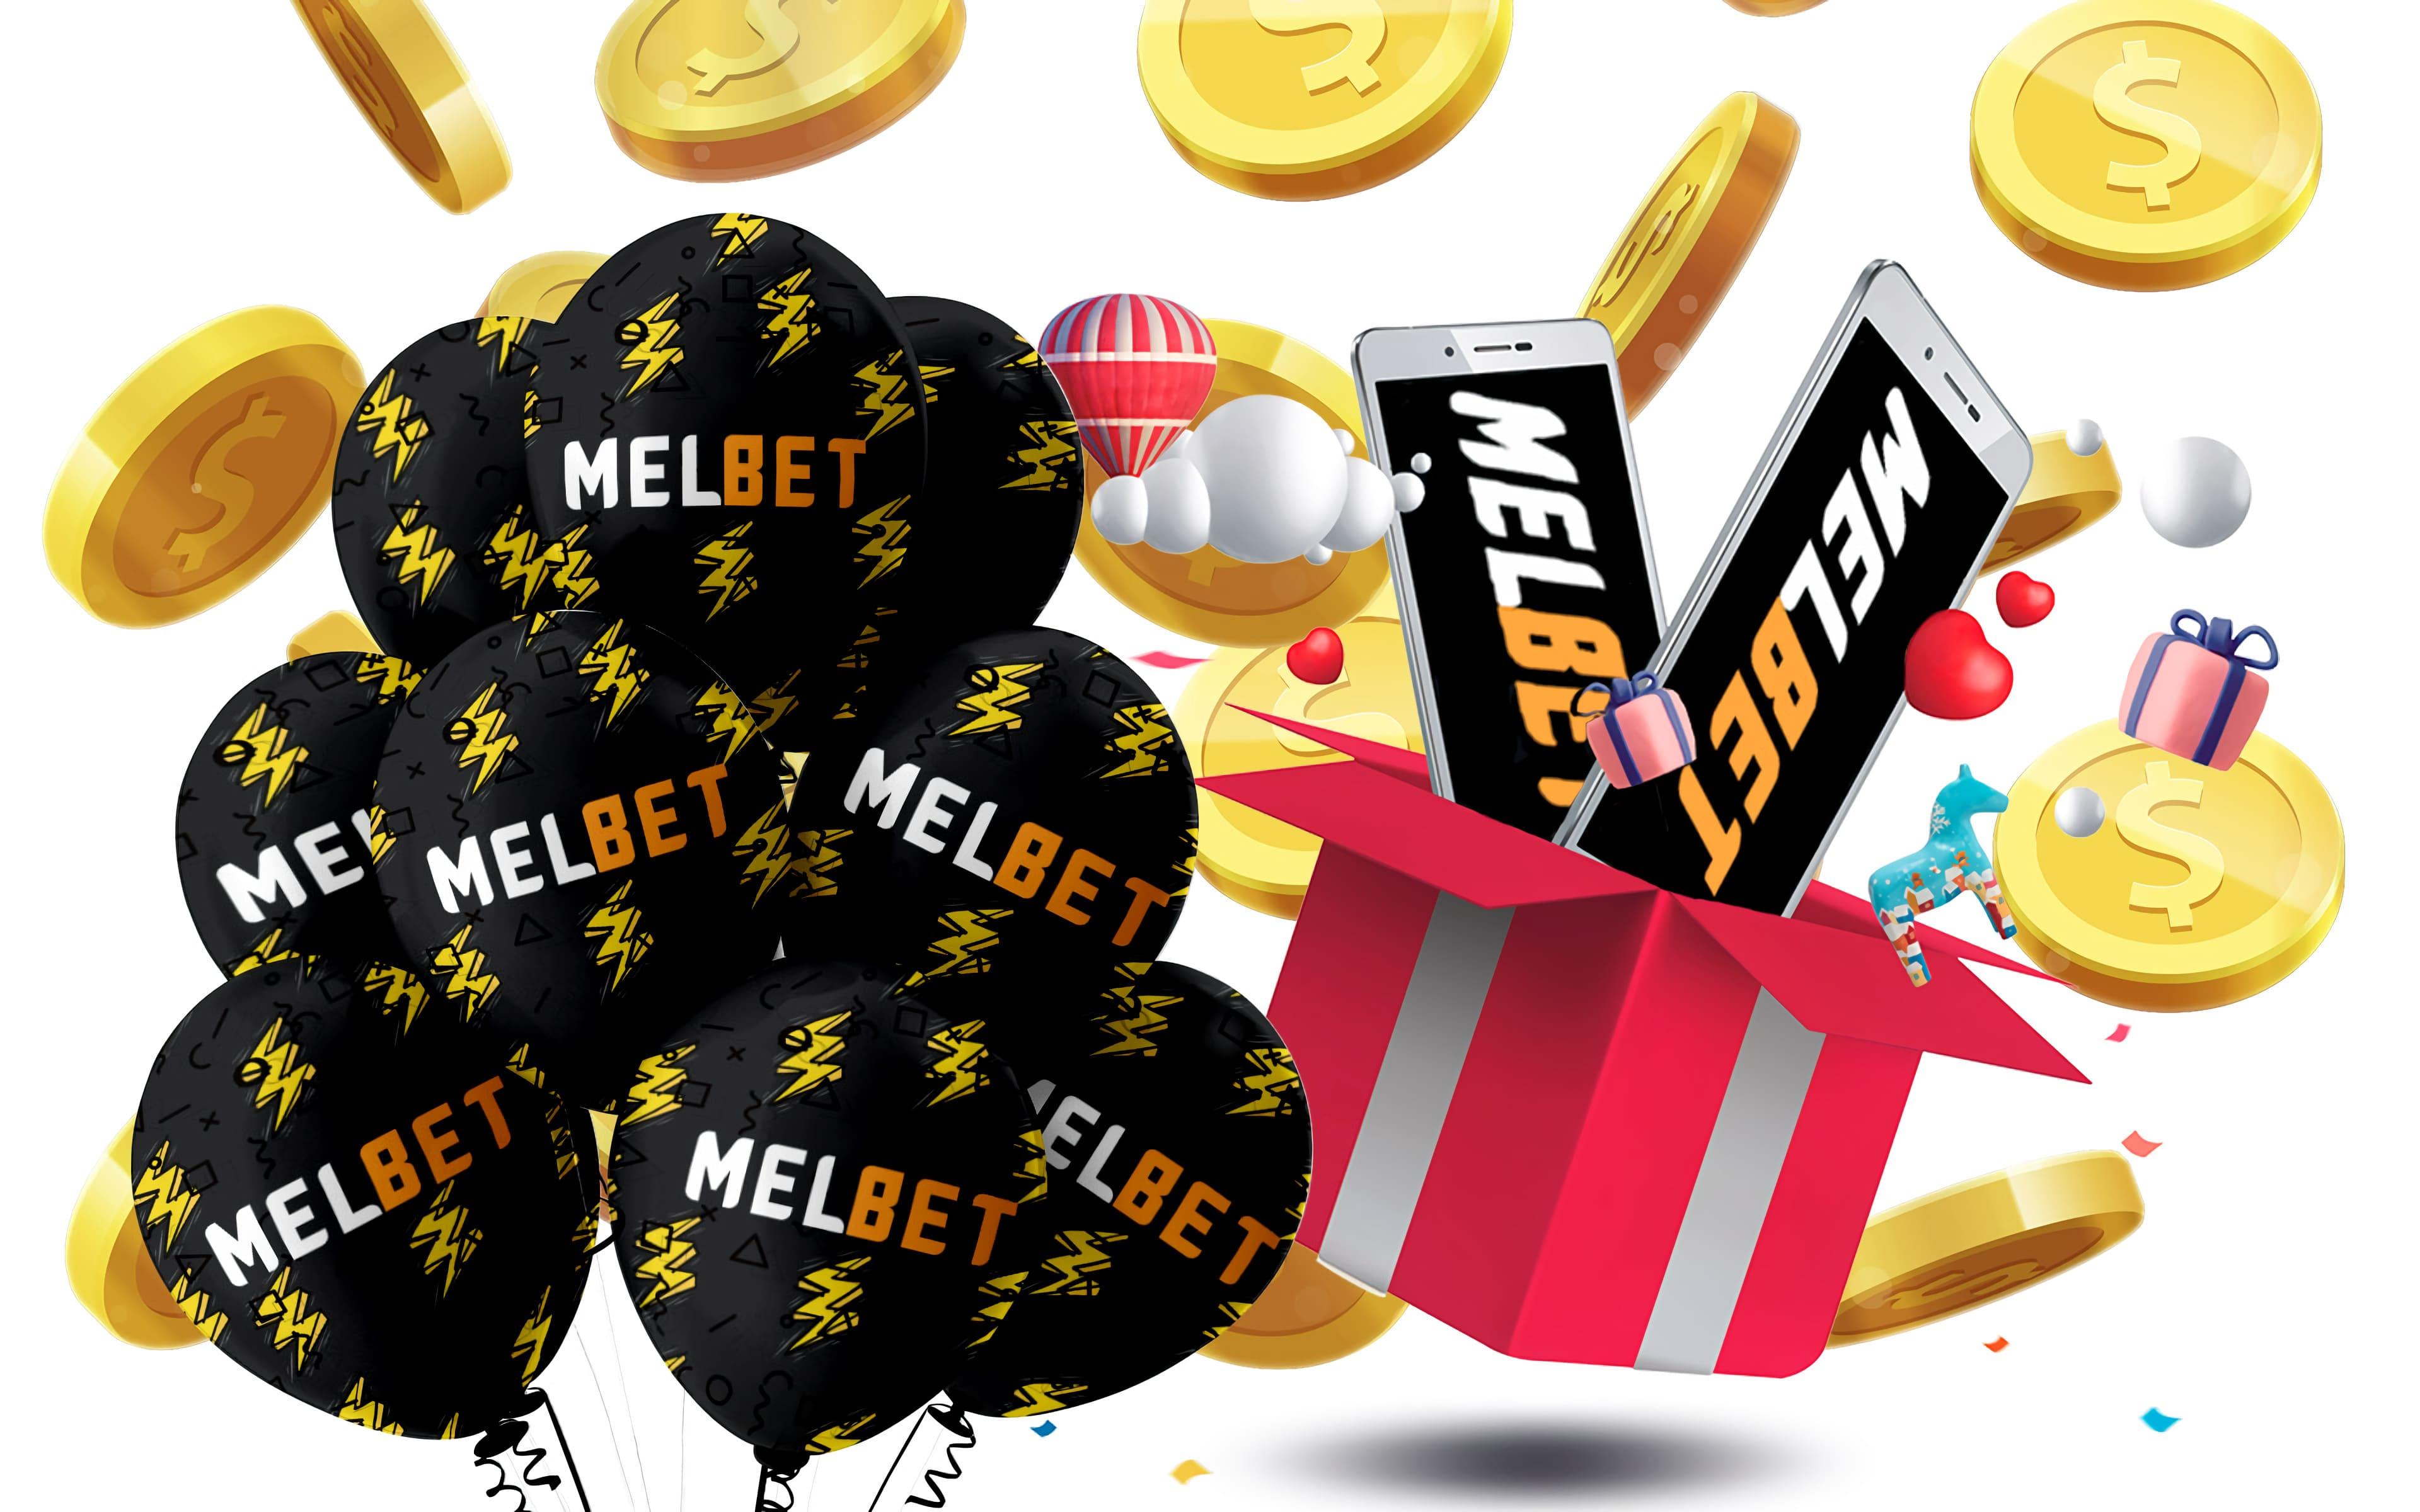 Melbet promo code and bonuses